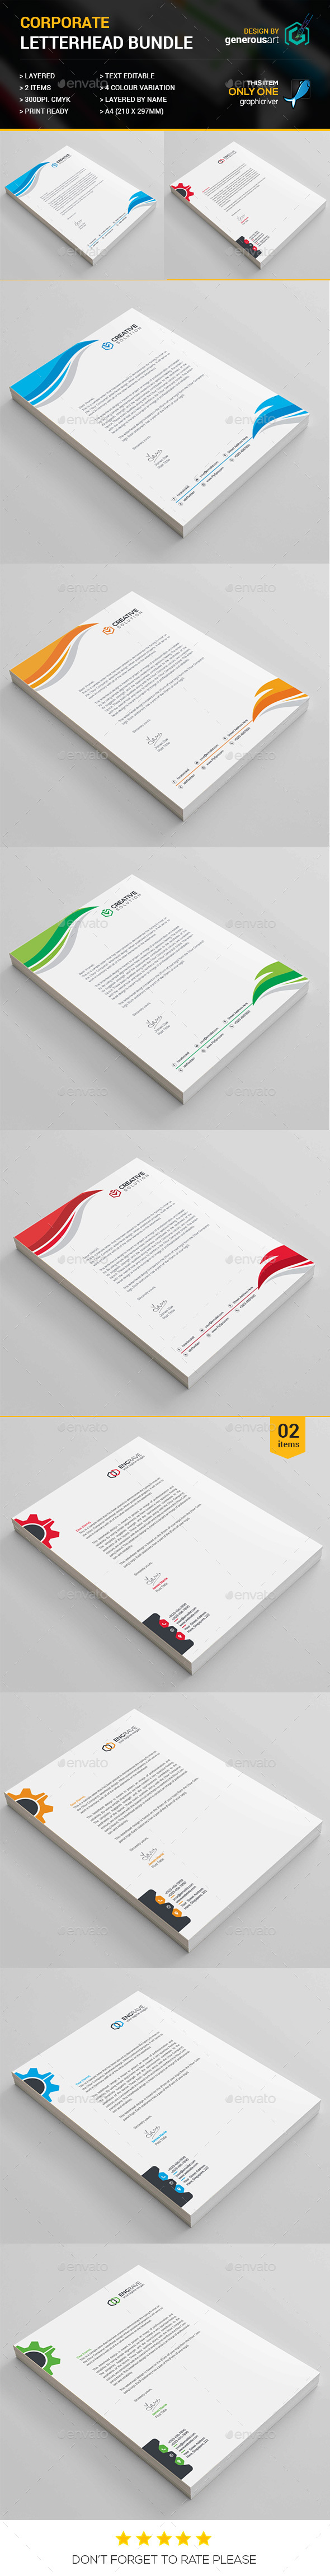 Corporate Letterhead Bundle - Stationery Print Templates